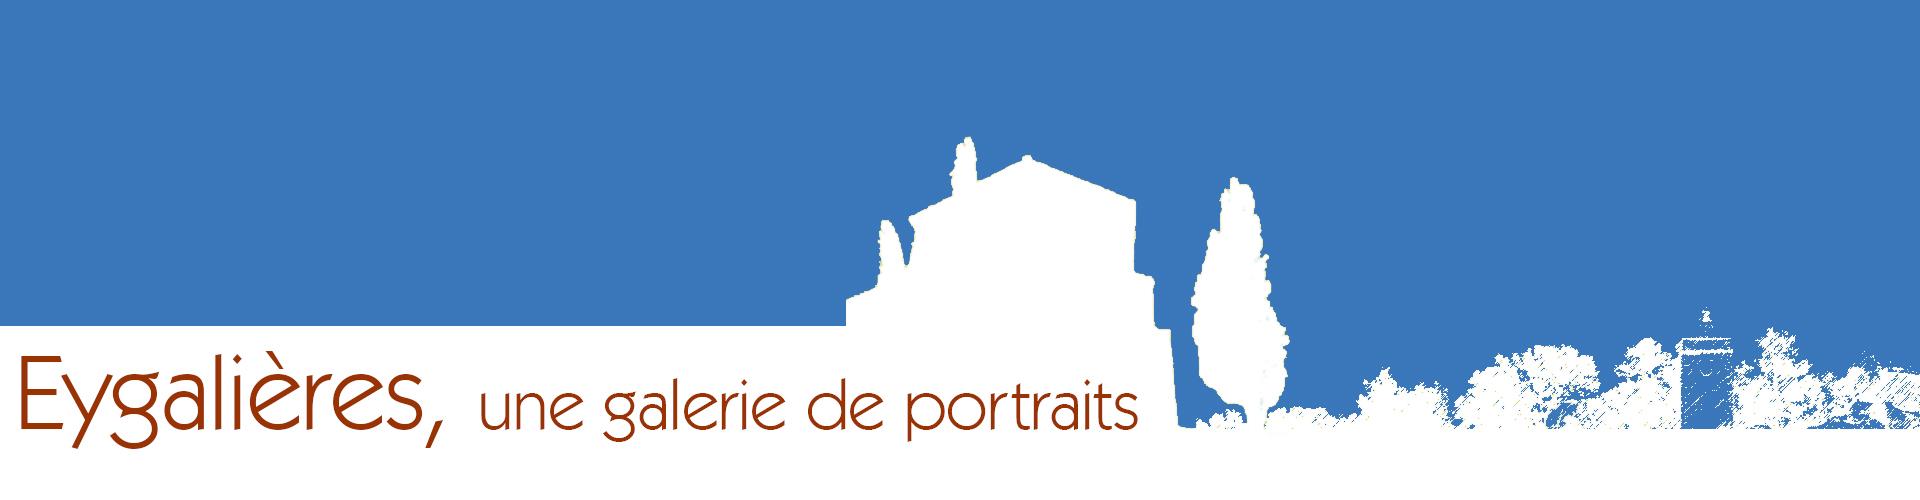 Eygalieres galerie de portraits